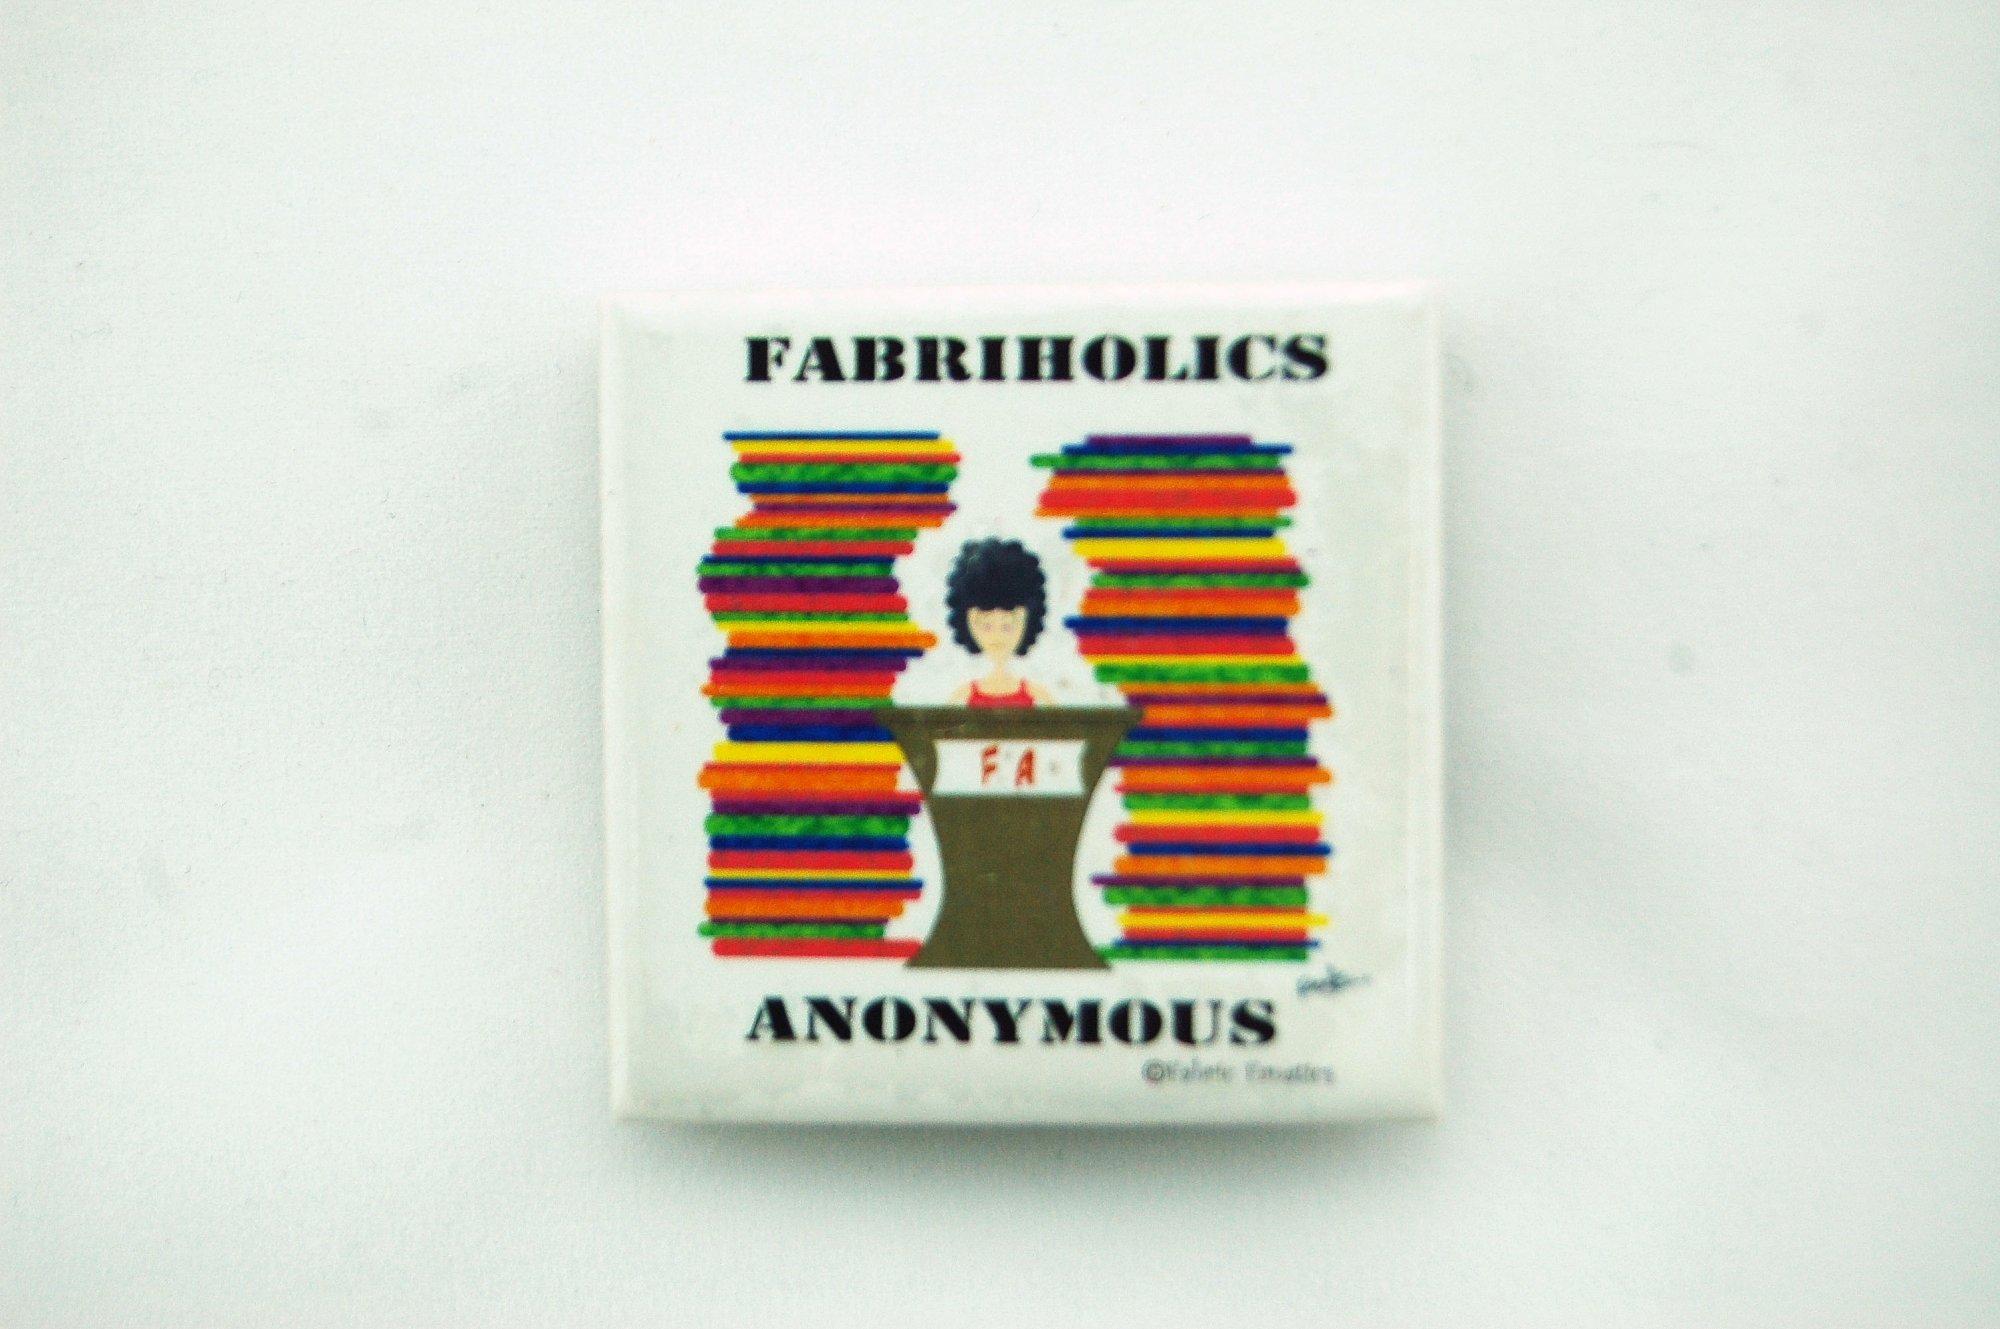 Fabricholics Anonymous Magnet